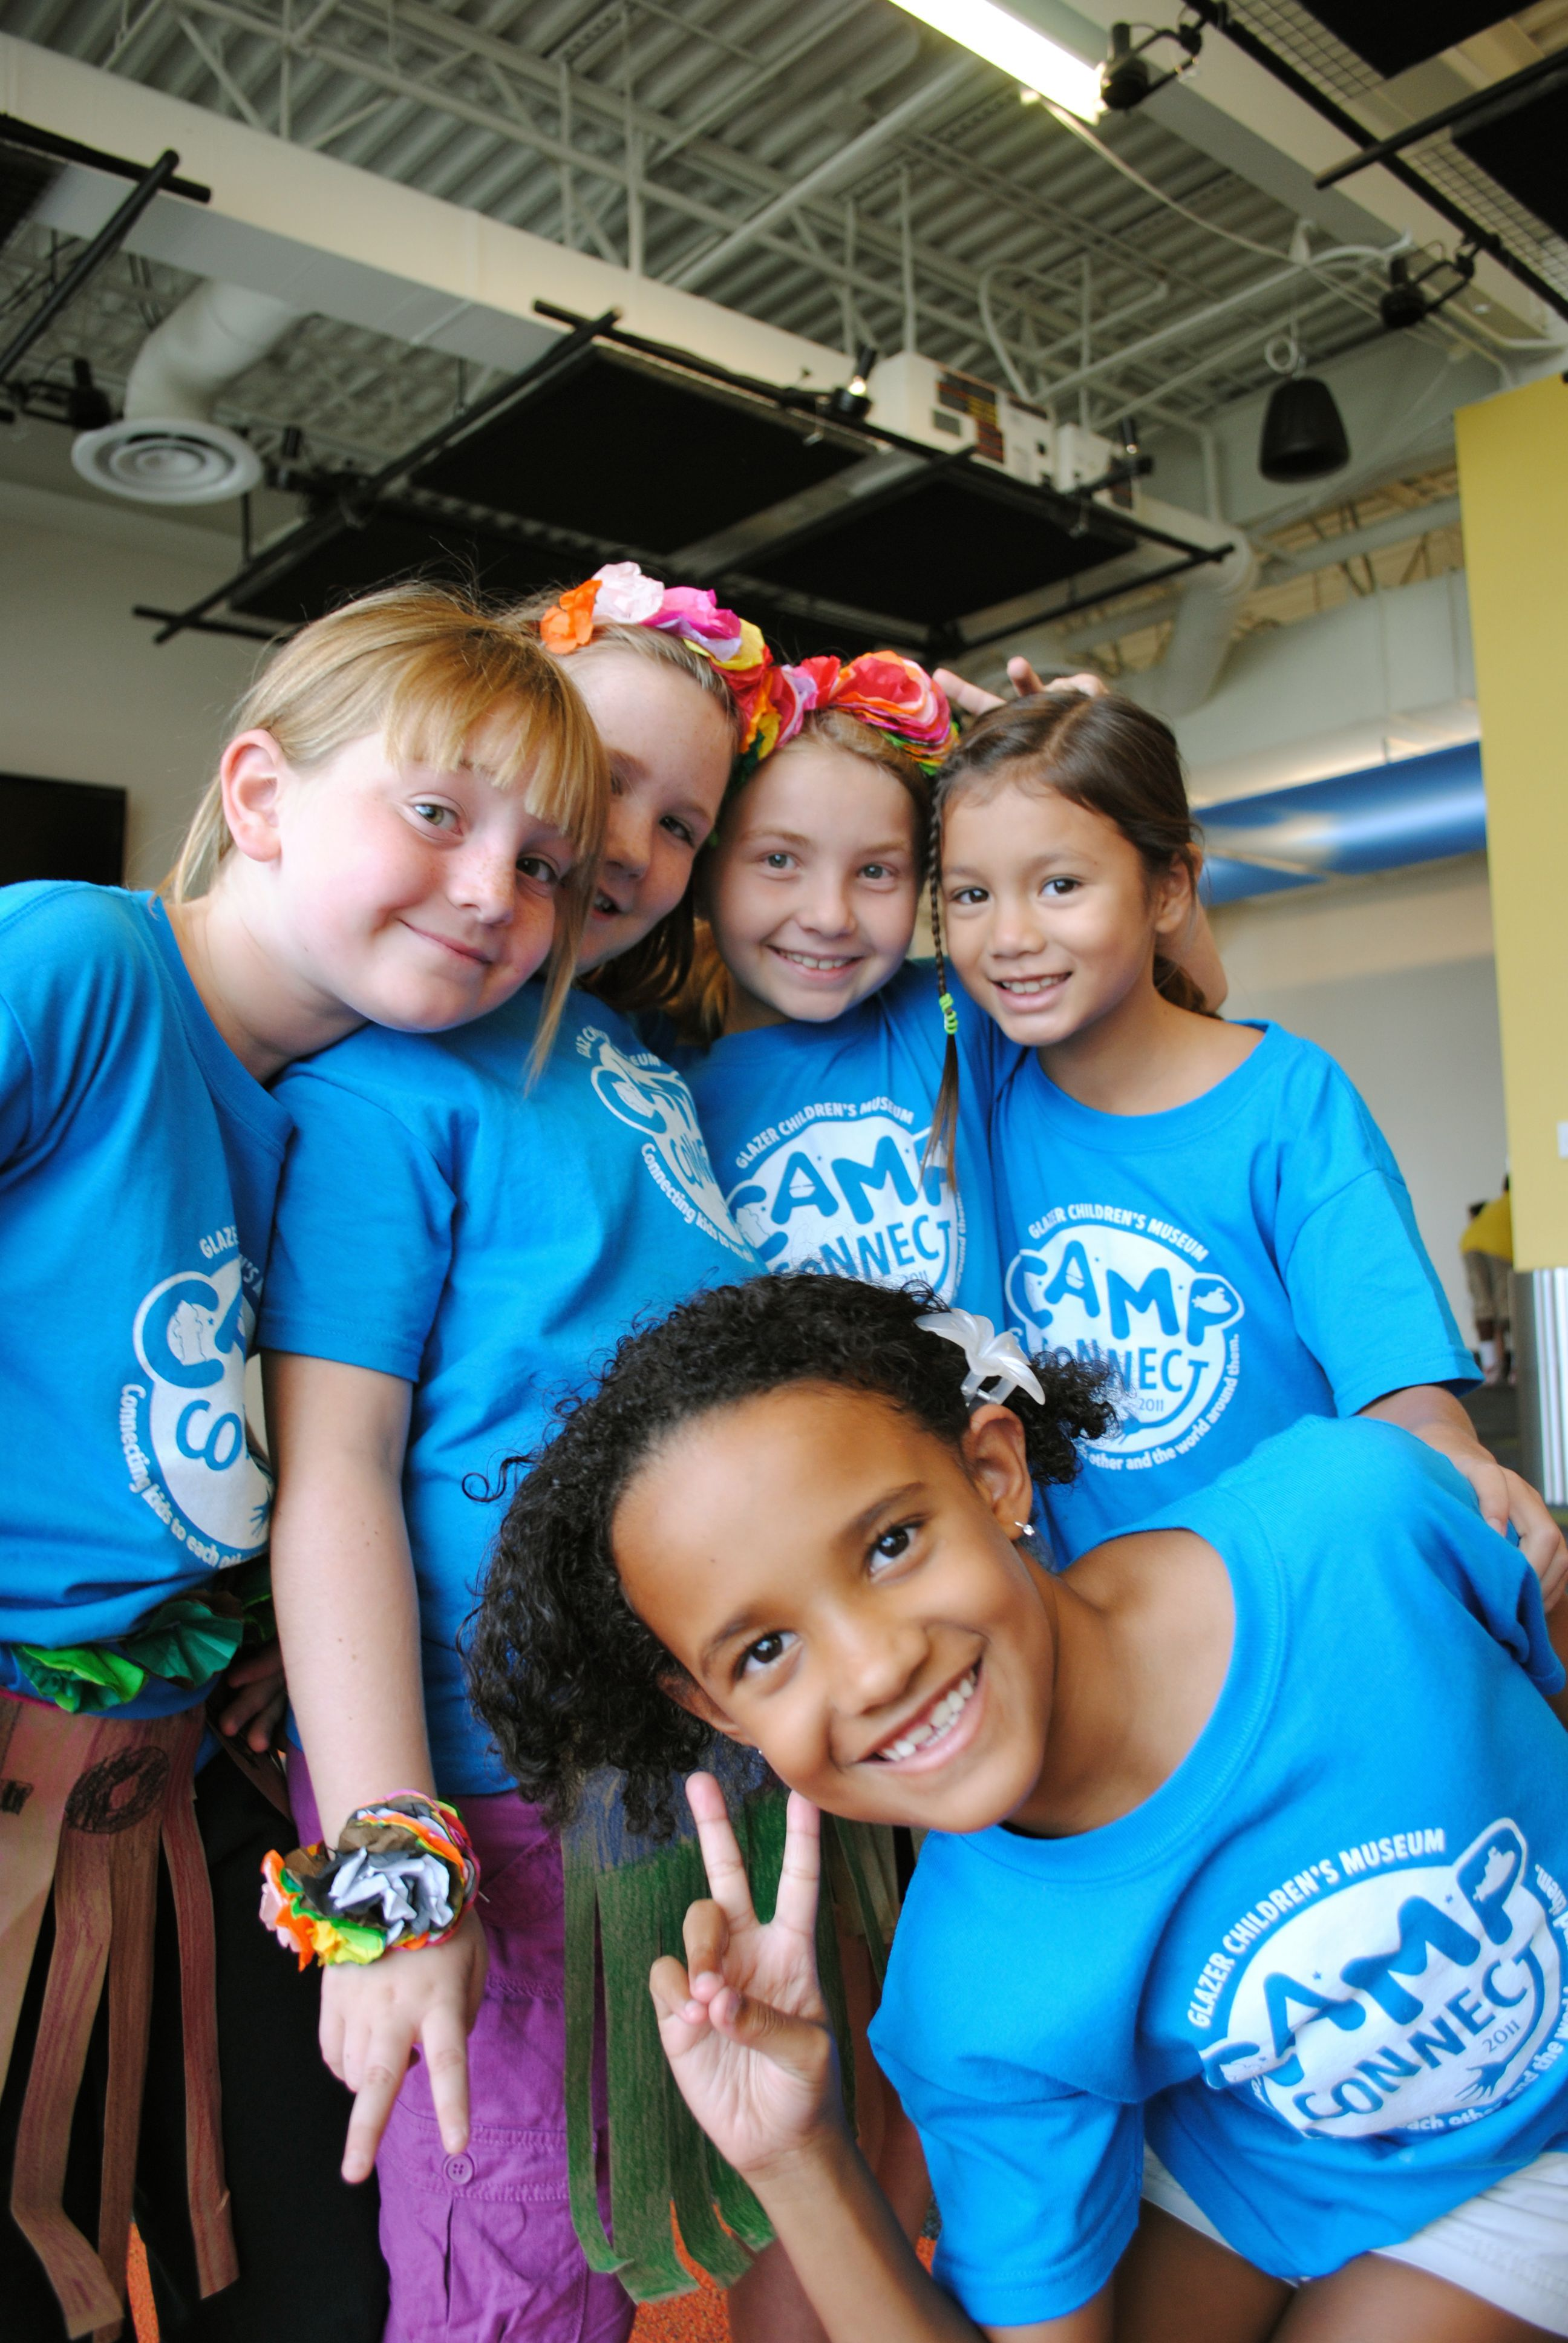 Creative exploration through play inspires children to